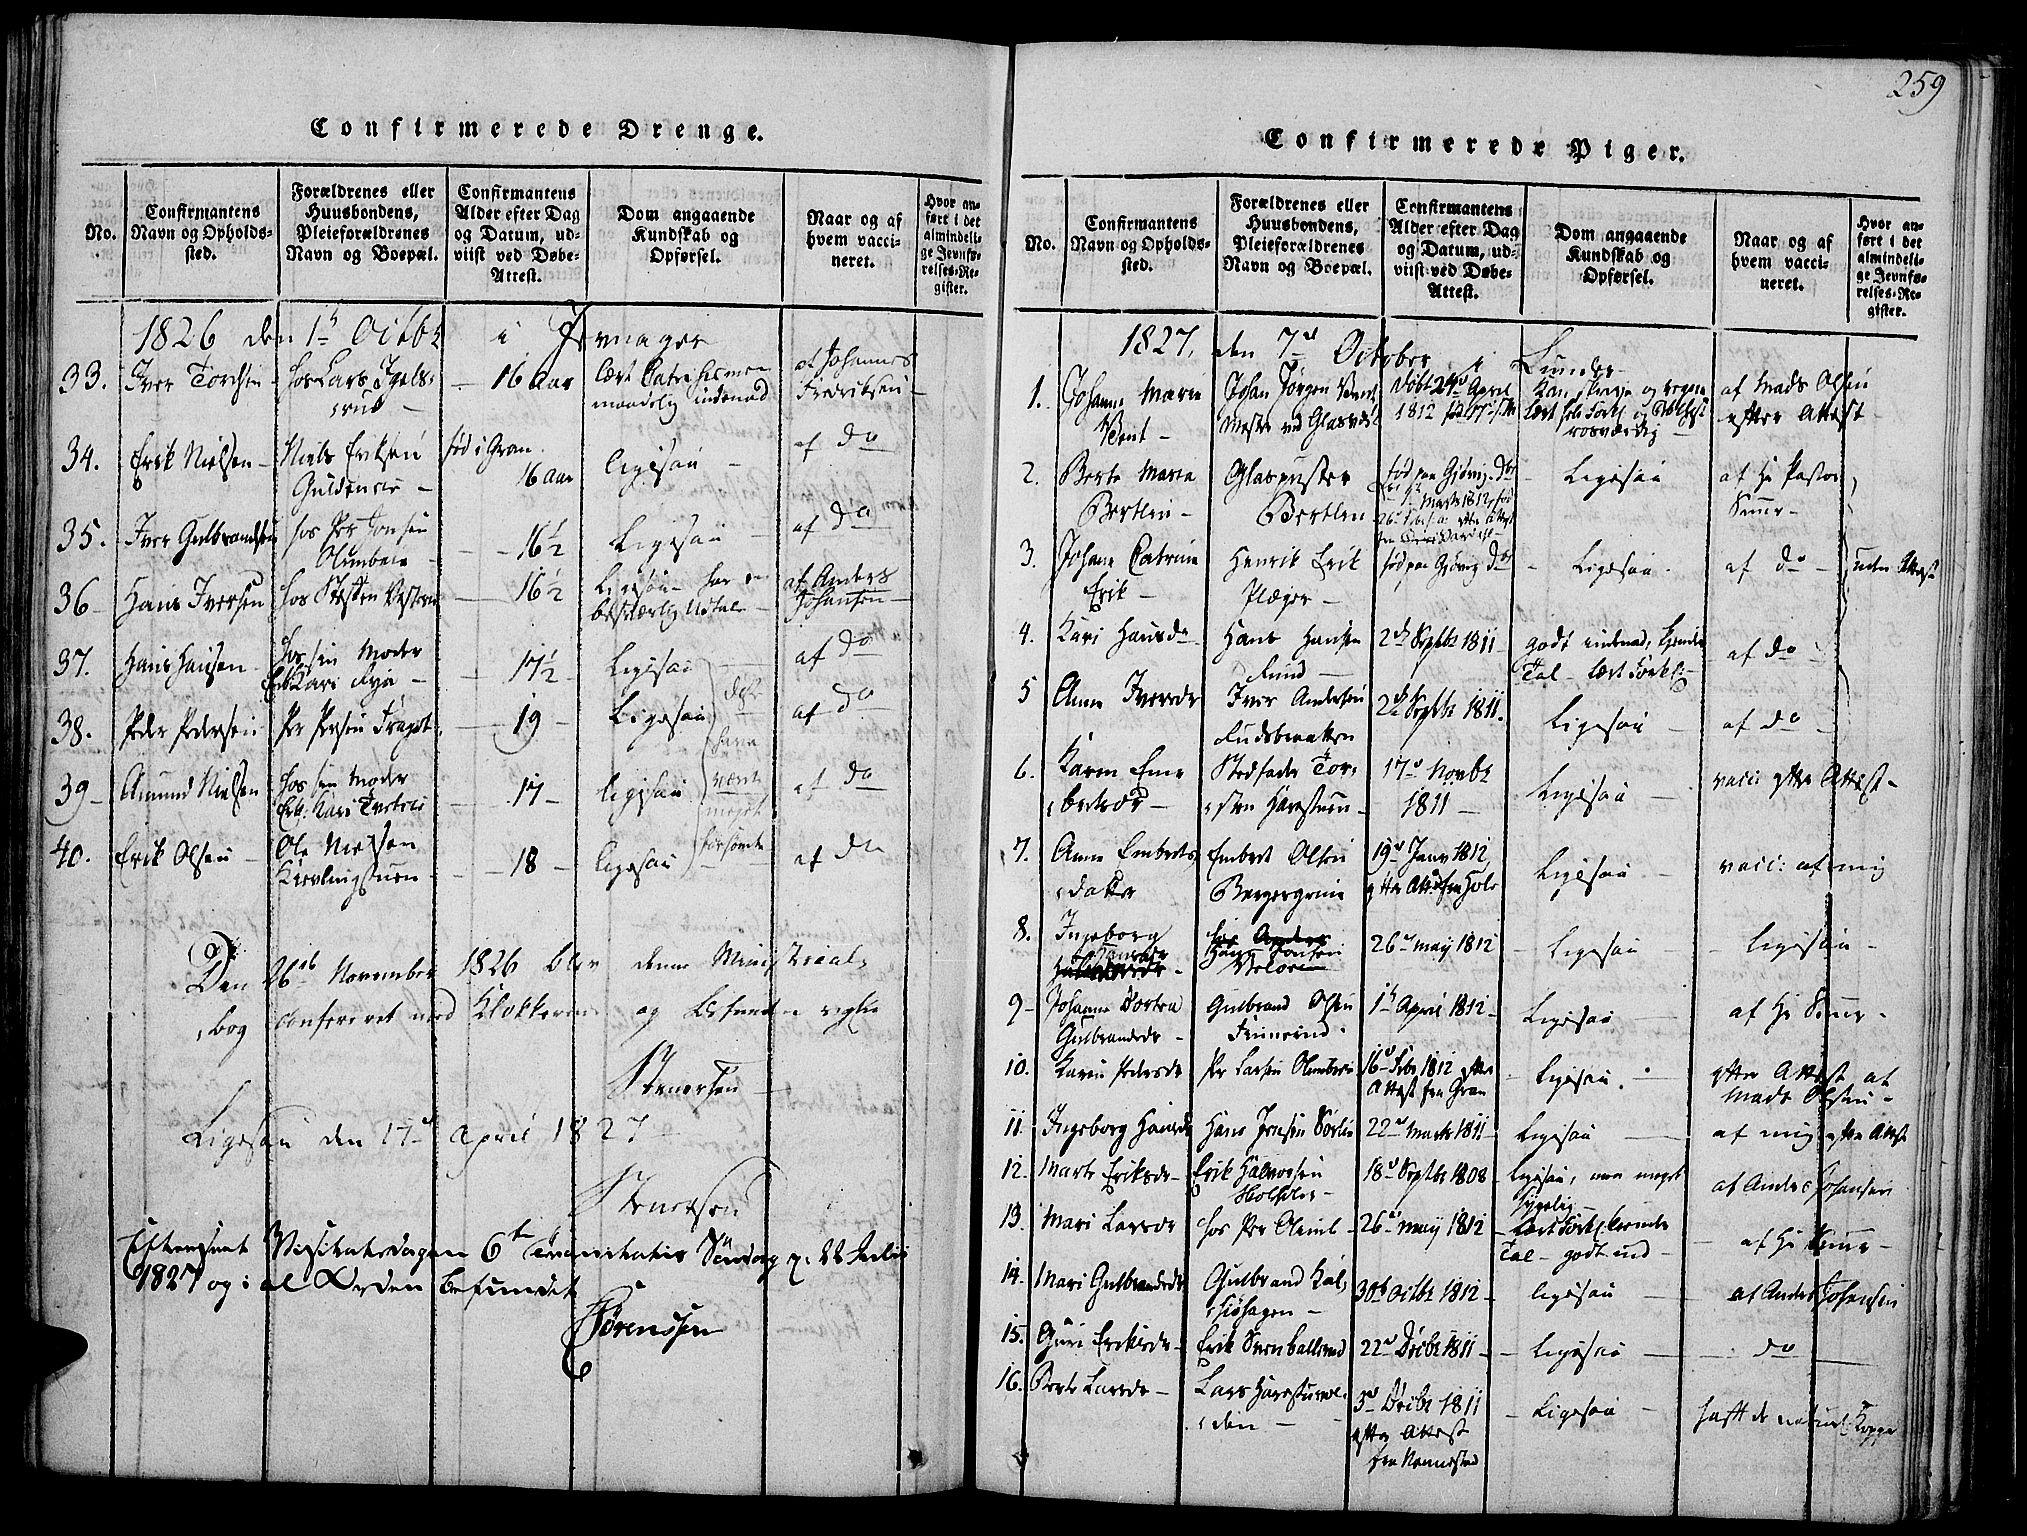 SAH, Jevnaker prestekontor, Ministerialbok nr. 5, 1815-1837, s. 259